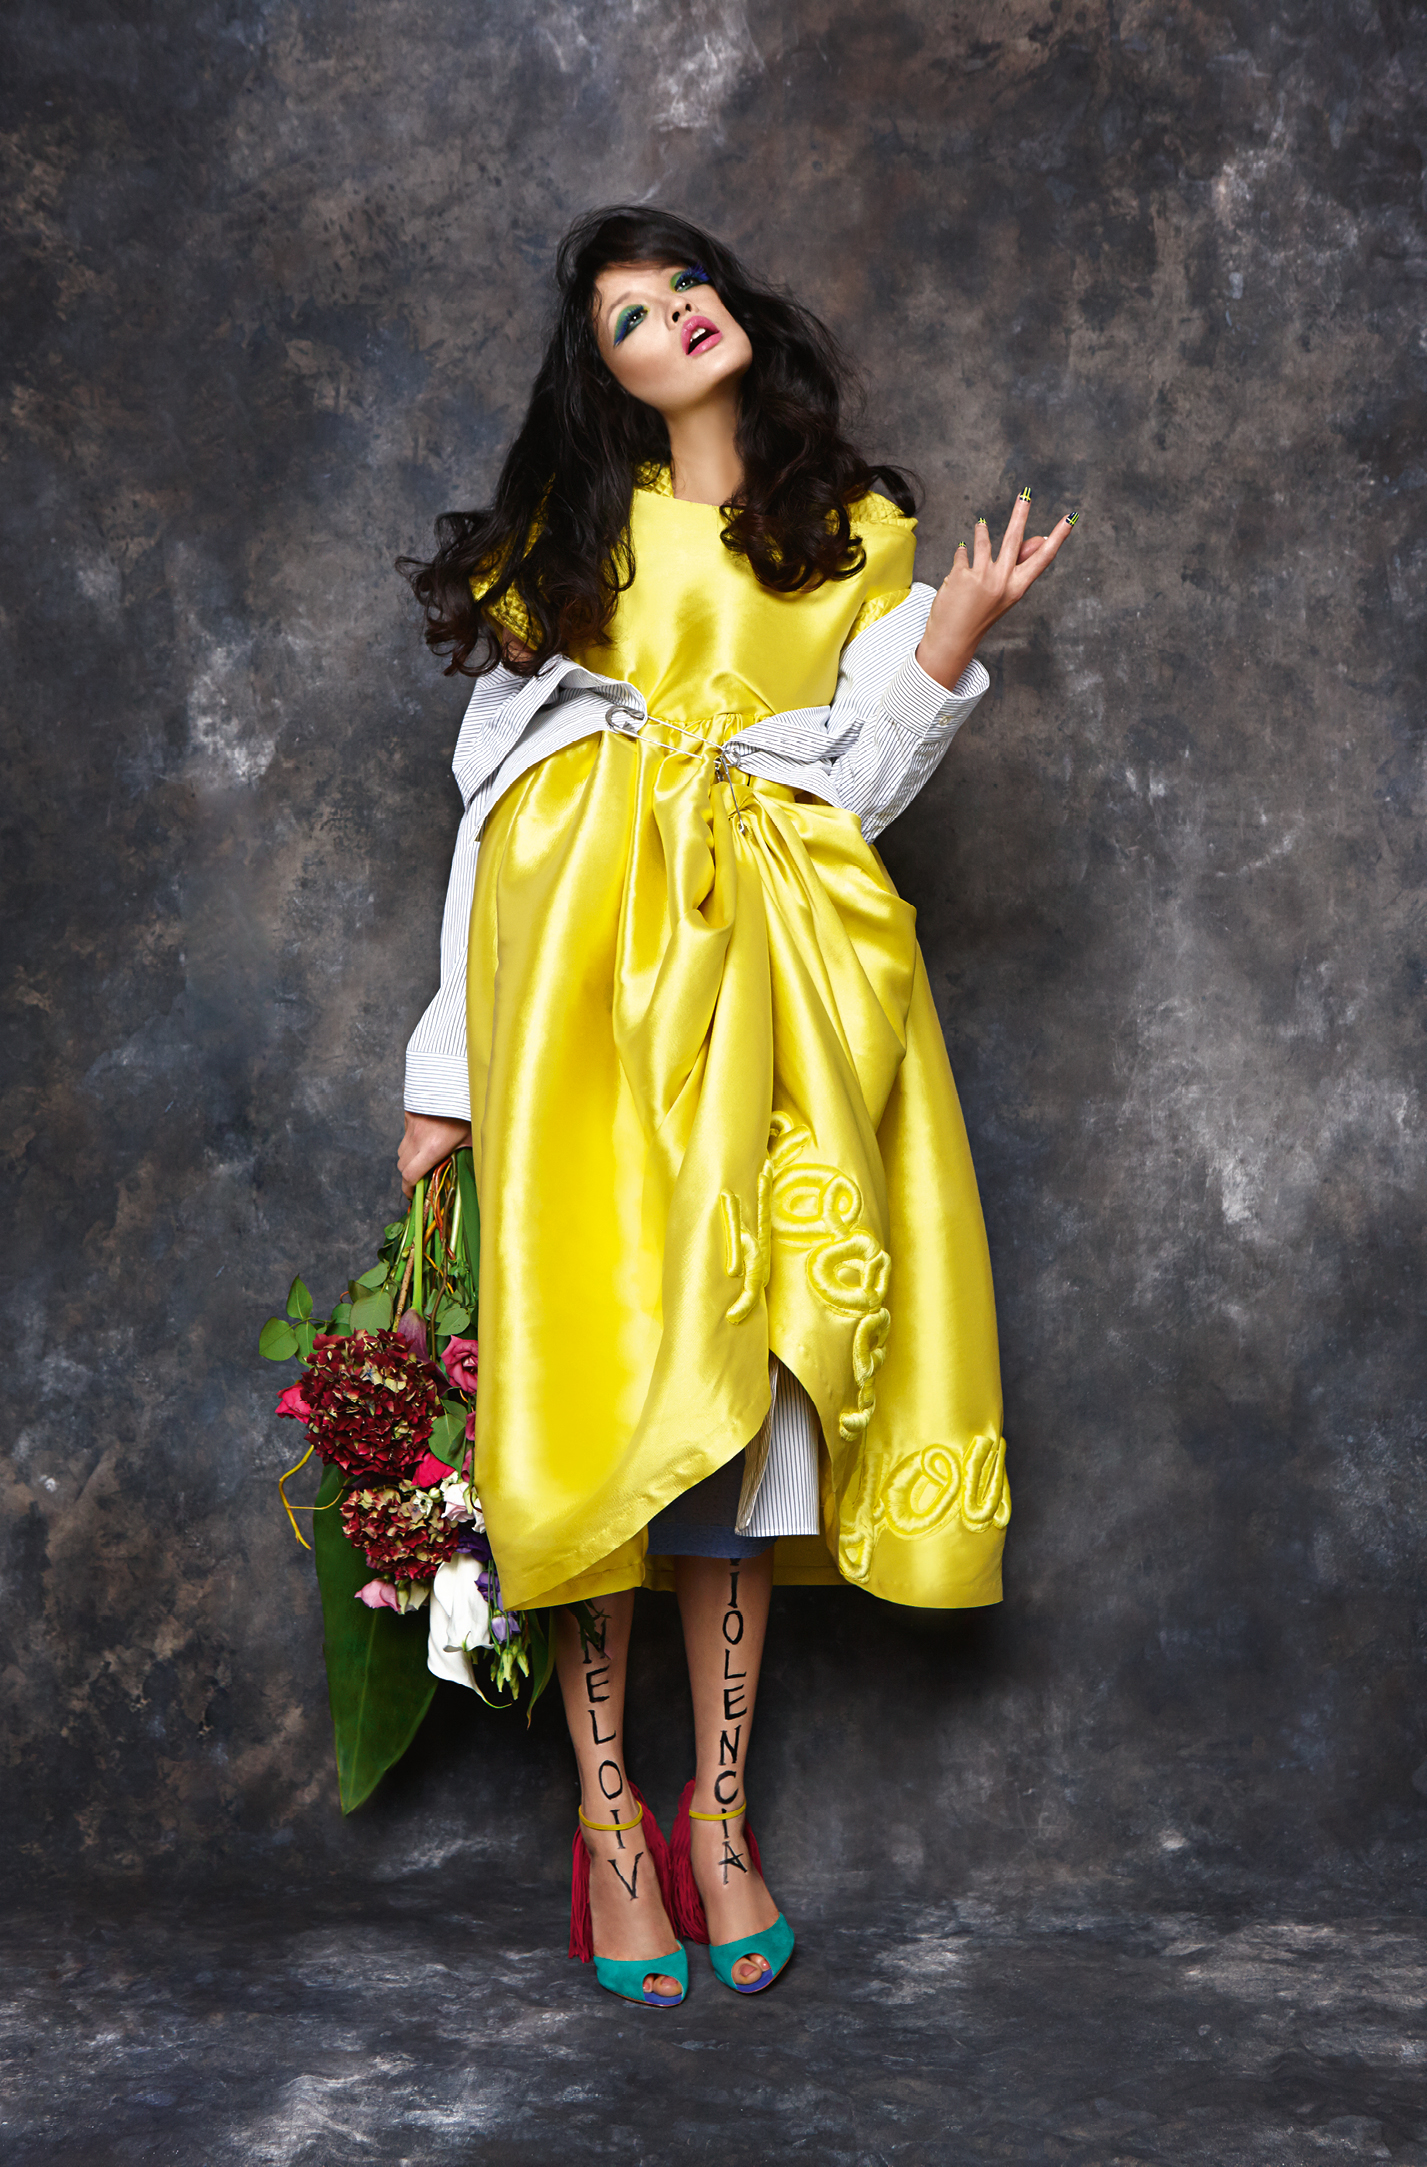 Yellow dress,  Fyodor Golan.  Striped shirt,  BACK.  Striped pencil skirt,  BACK.  Blue floral shirt,  Zeynep Tosun.  Shoes w/pink tassels,  Christian Louboutin.